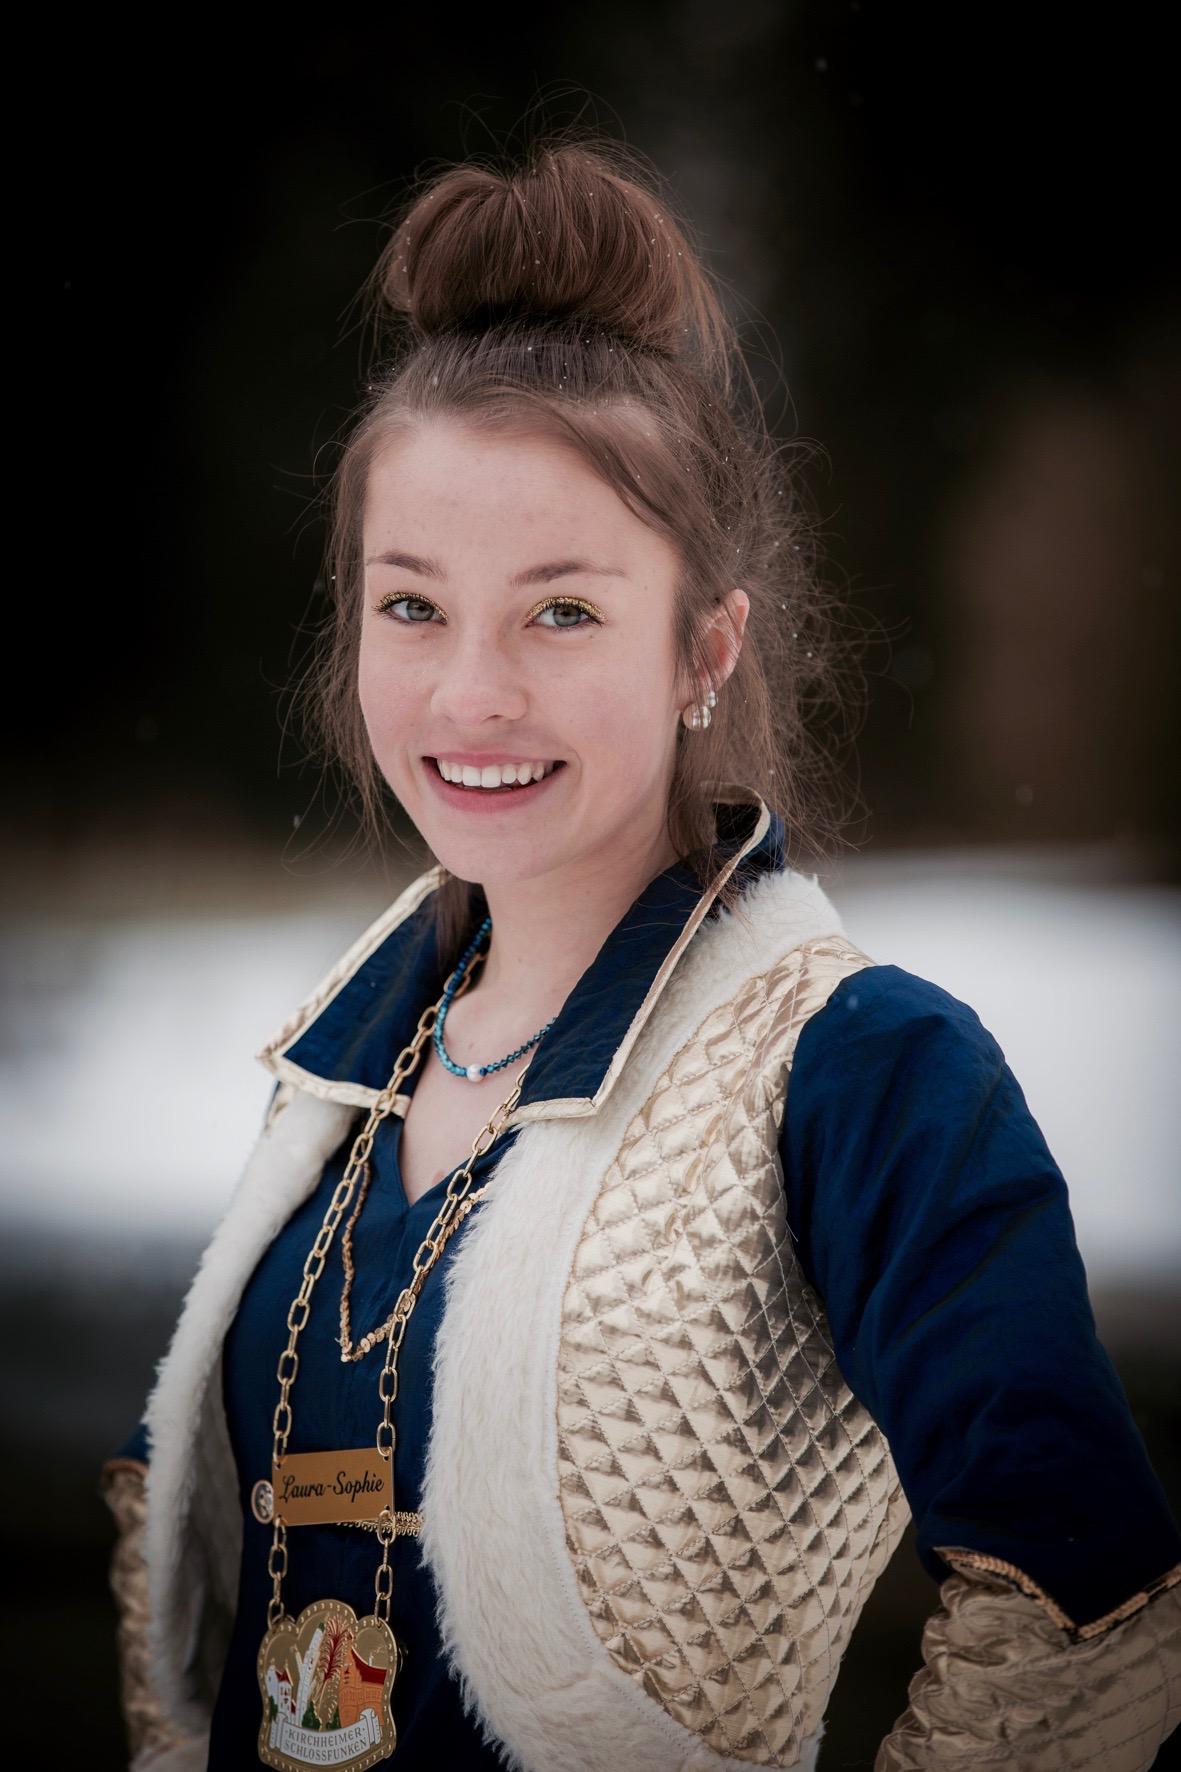 Laura-Sophie Rogg